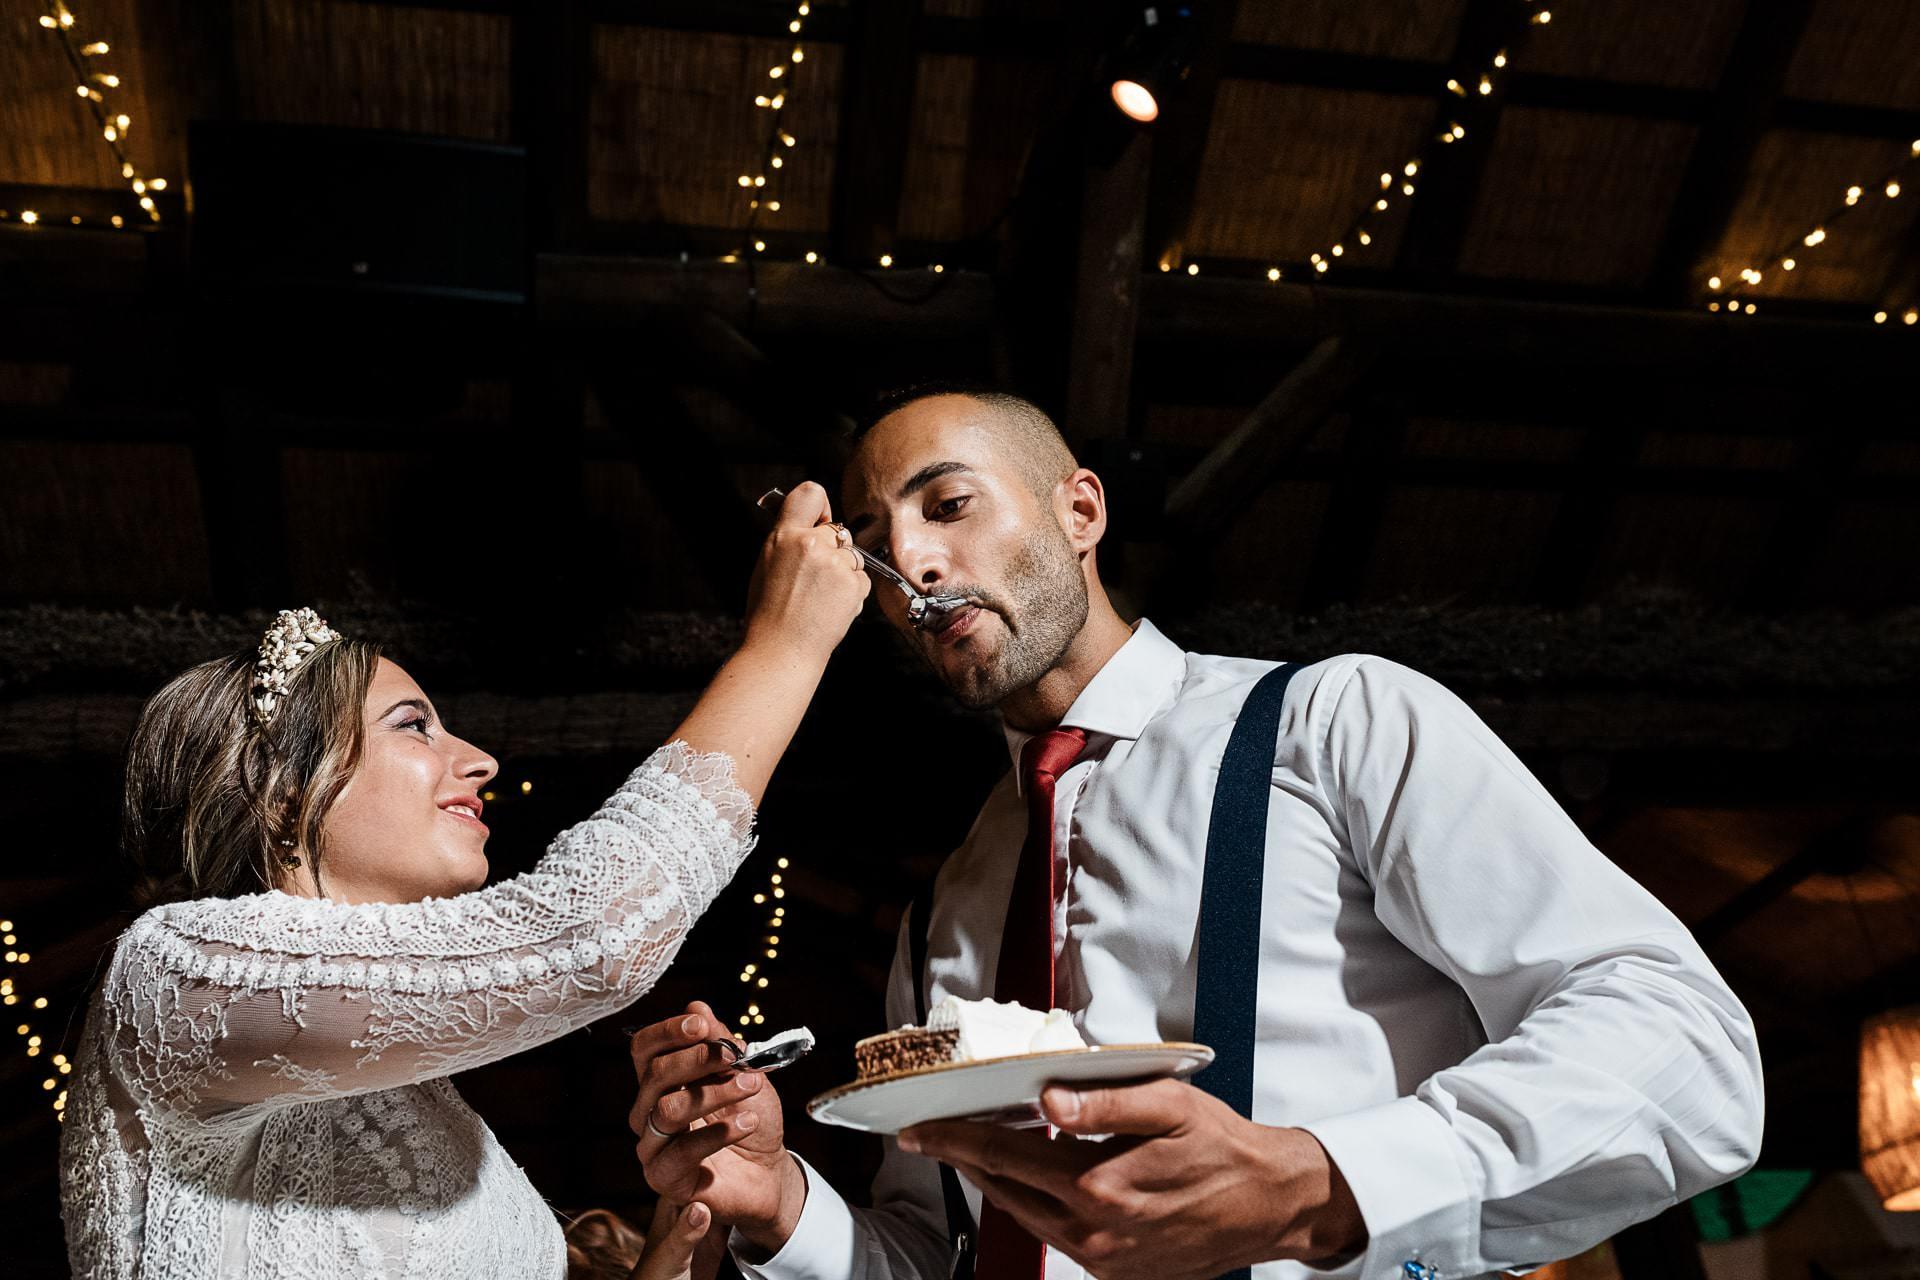 Corte de tarta de boda en la palapa del Candado Beach Málaga